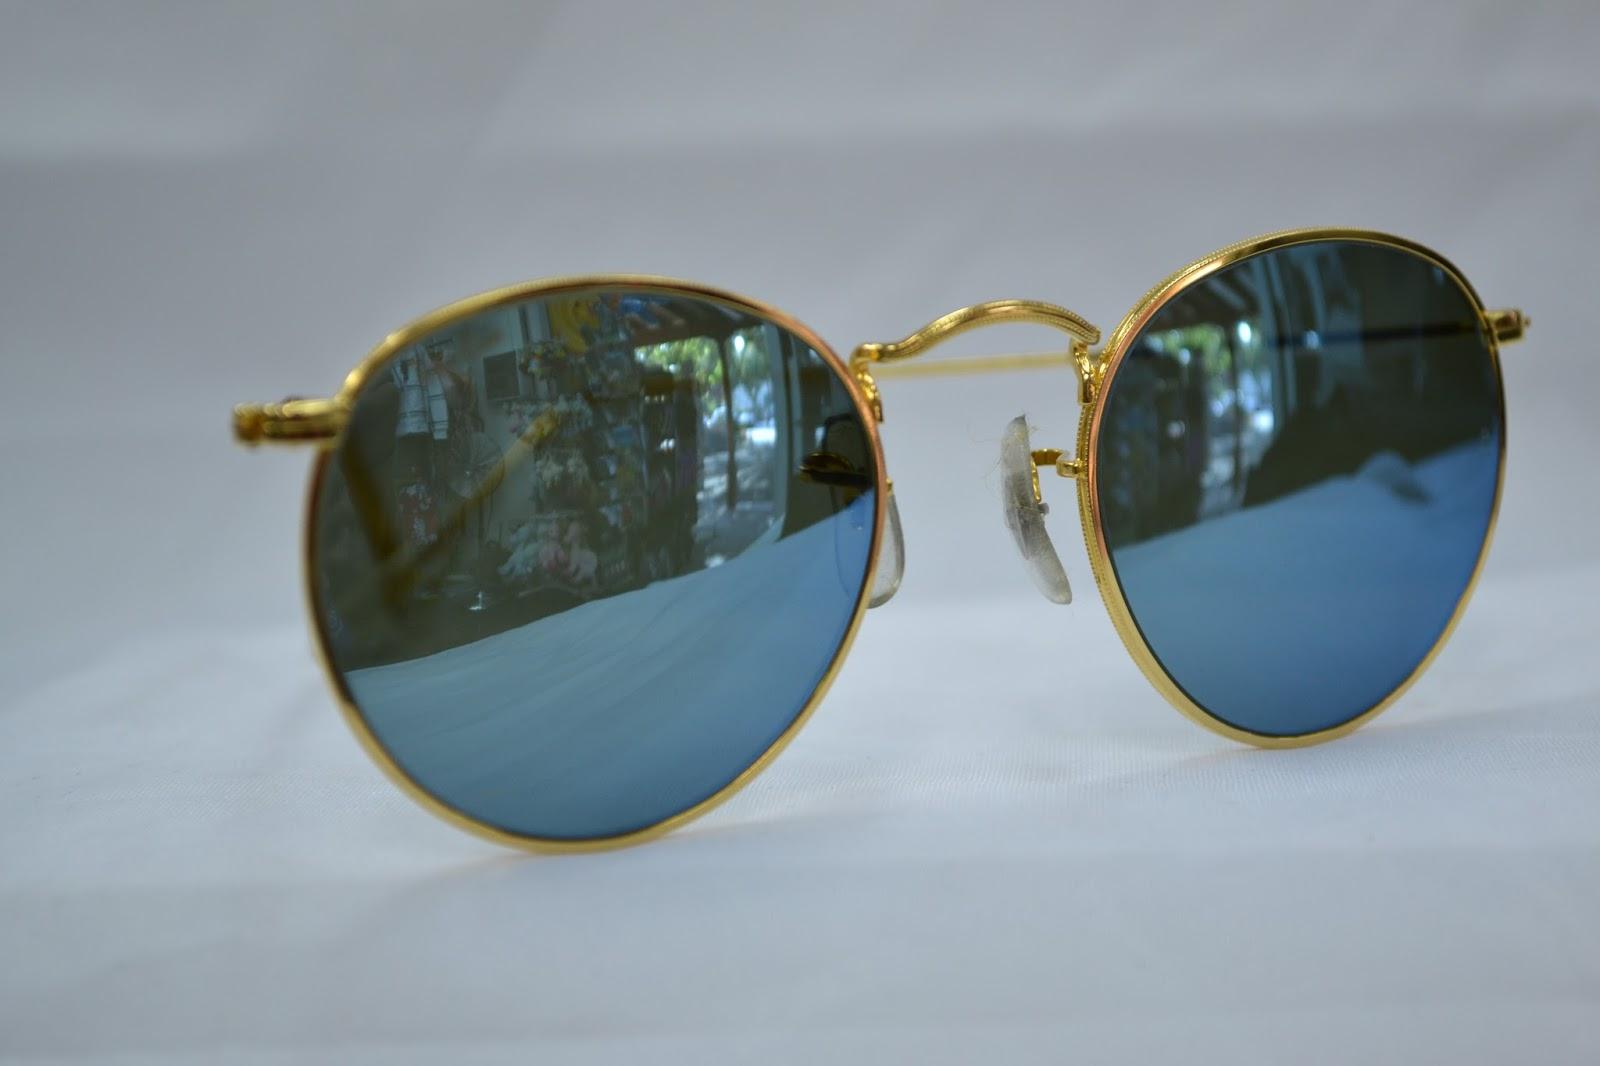 0fb8fda1600 Vintage Ray Ban Round metal Blue Mirror!! NOS! 90´S! LENNON STYLE! (SOLD)